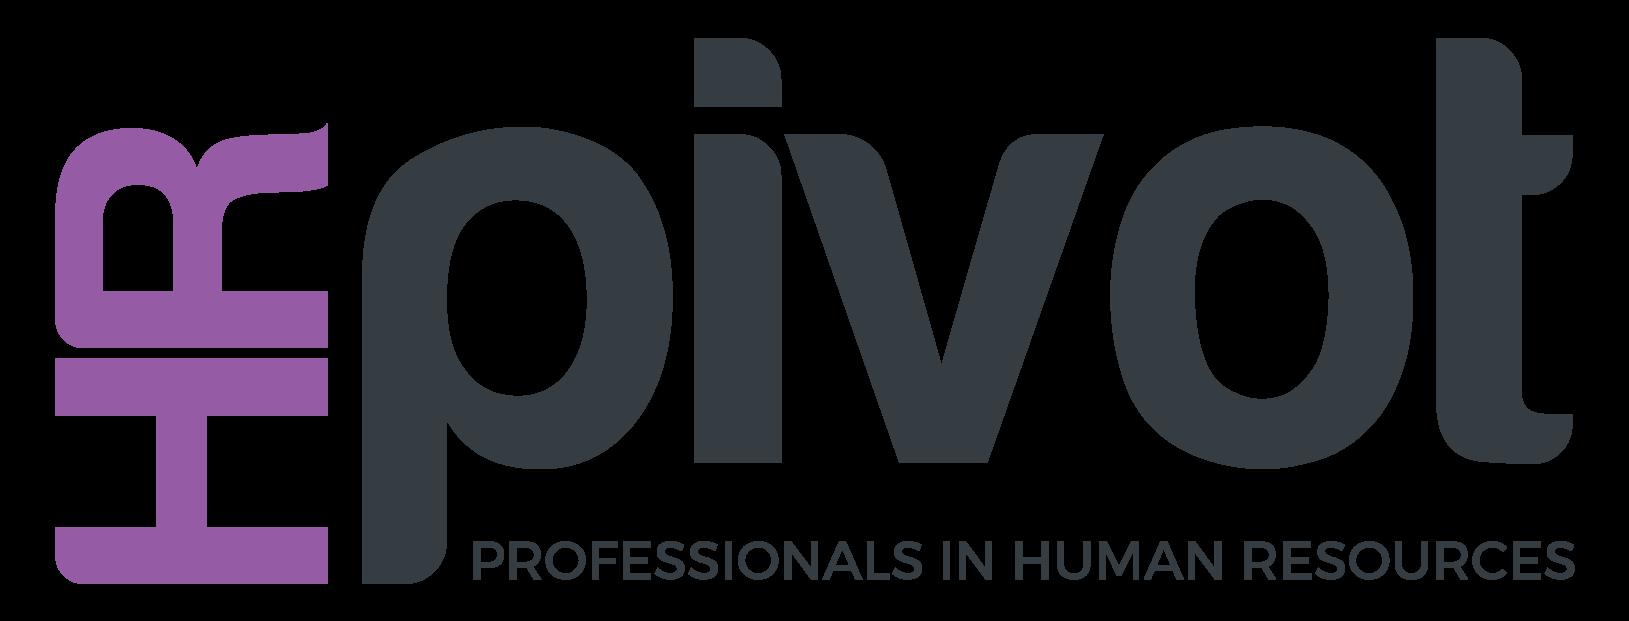 HR Recruiter job in Phoenix - HRPivot